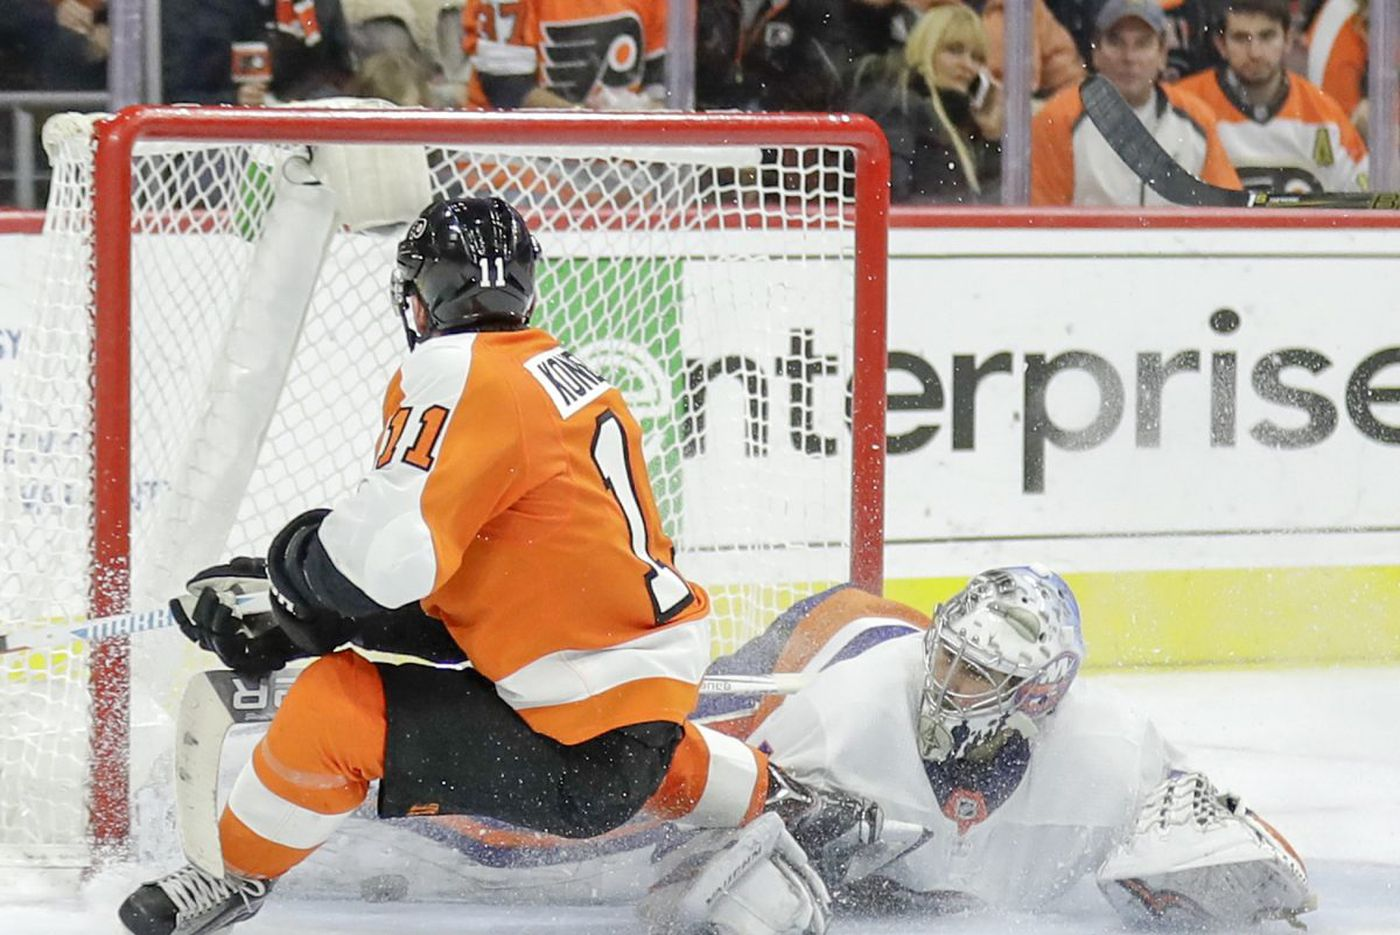 'Little waterbug' Travis Konecny sparks Flyers' fourth line